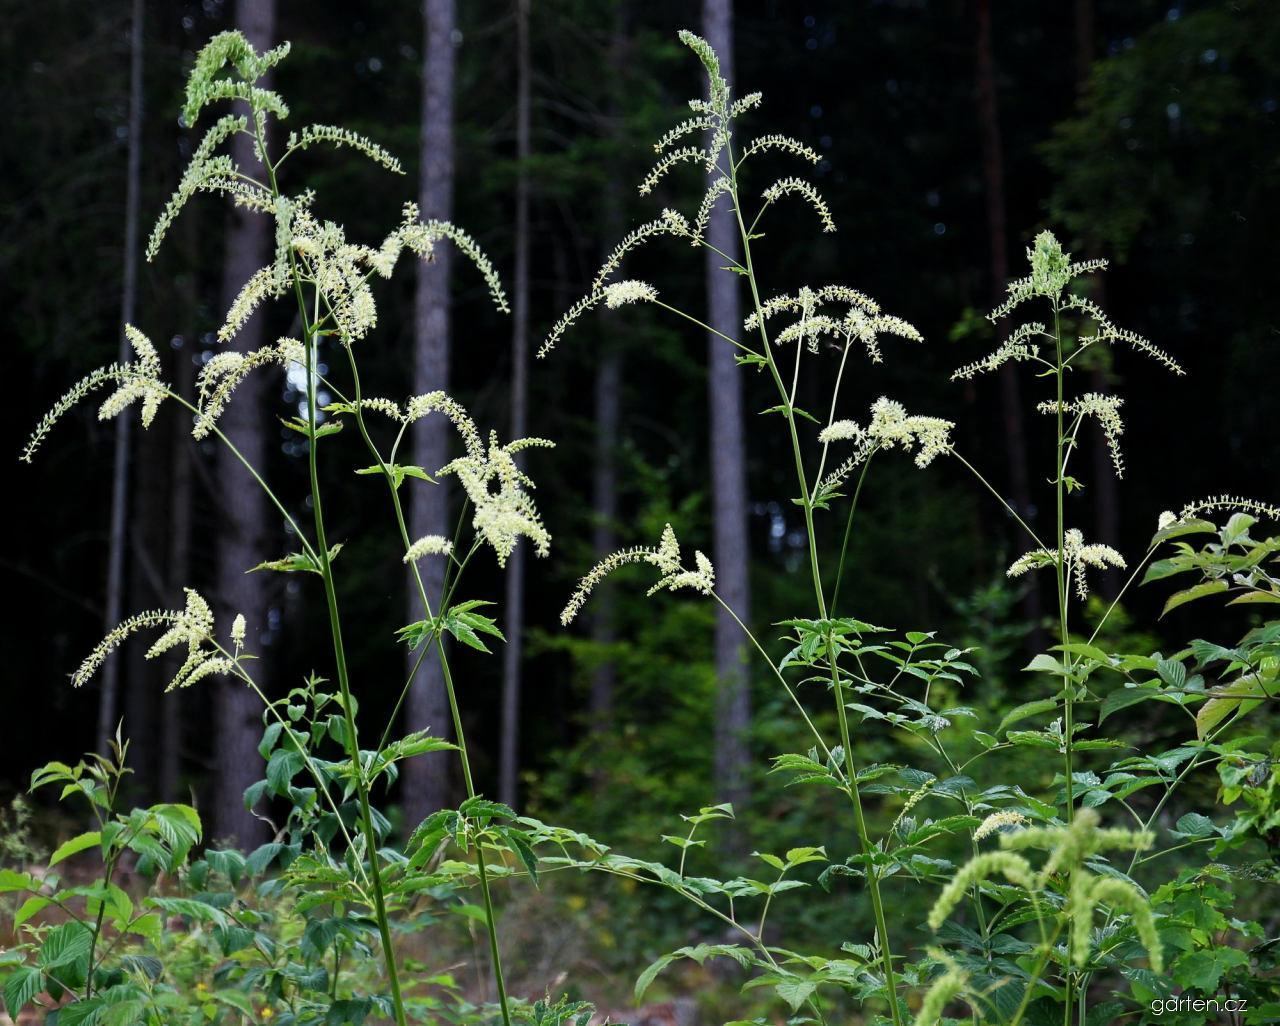 Ploštičník evropský (Actaea europaea)